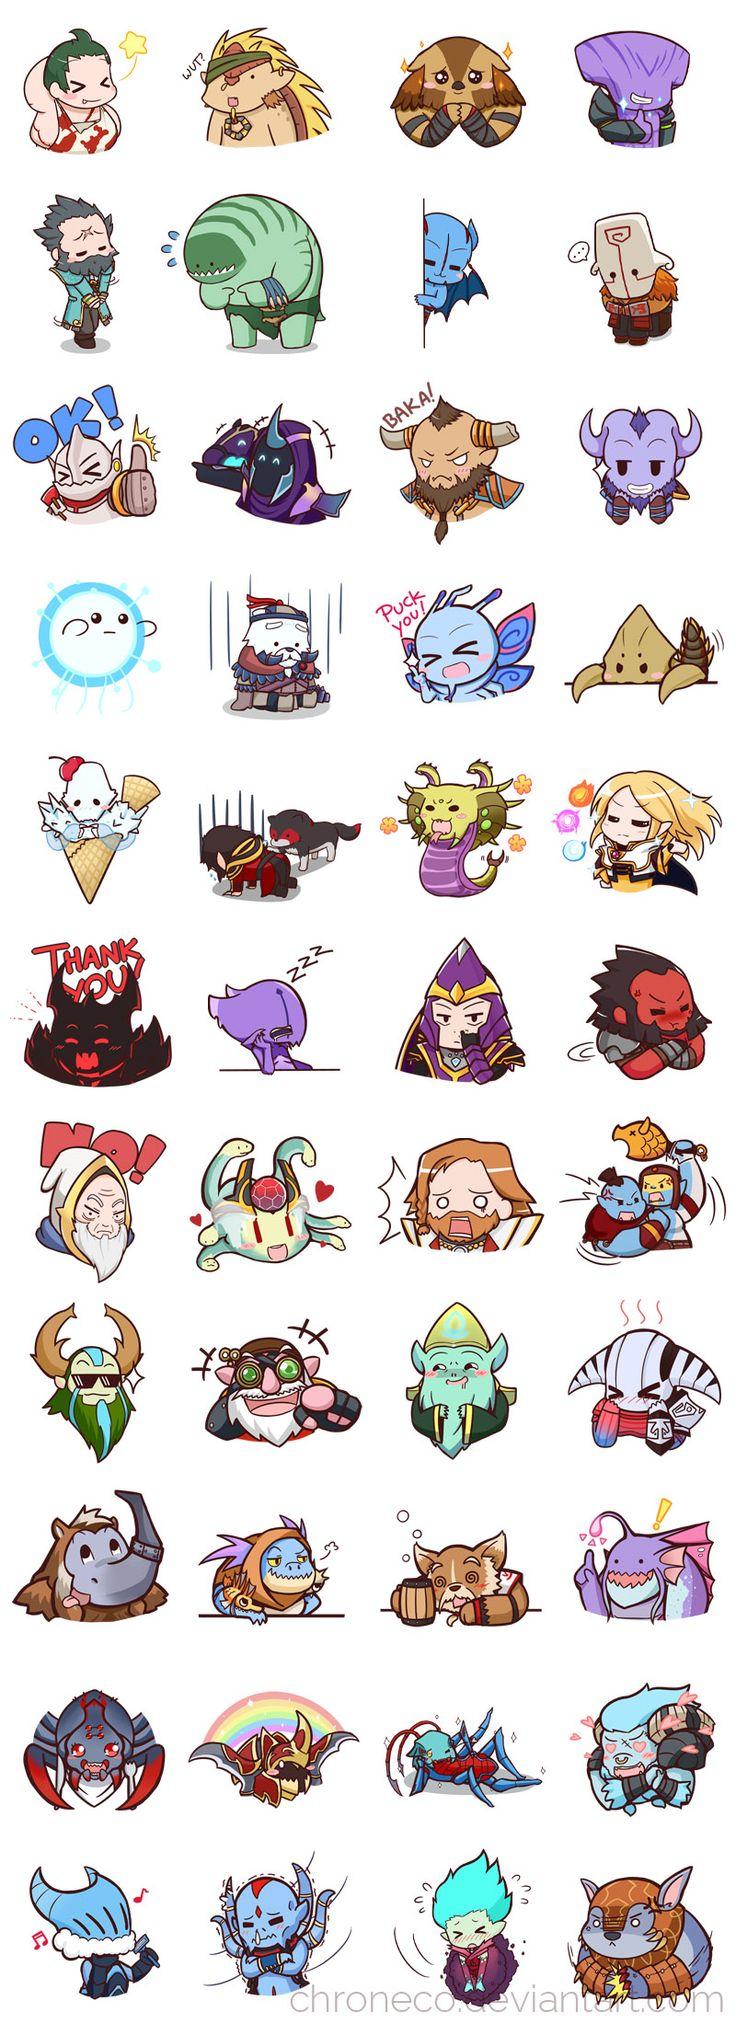 Dota2 Sticker - Compilation by chroneco on DeviantArt